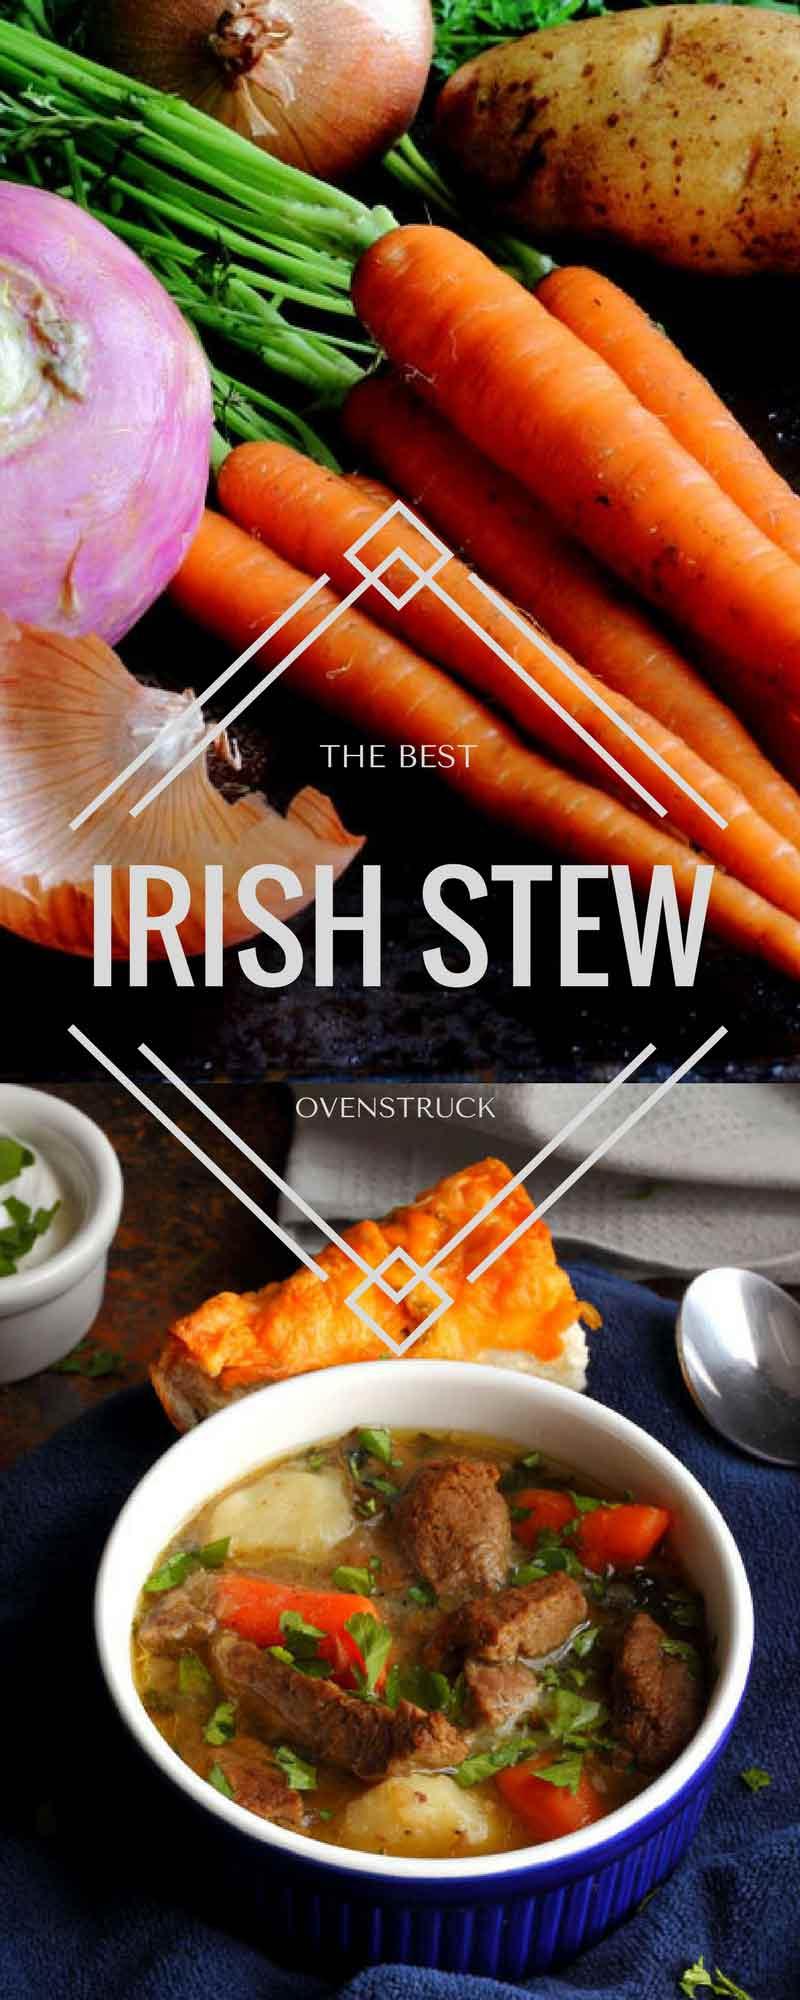 The Best Irish Stew